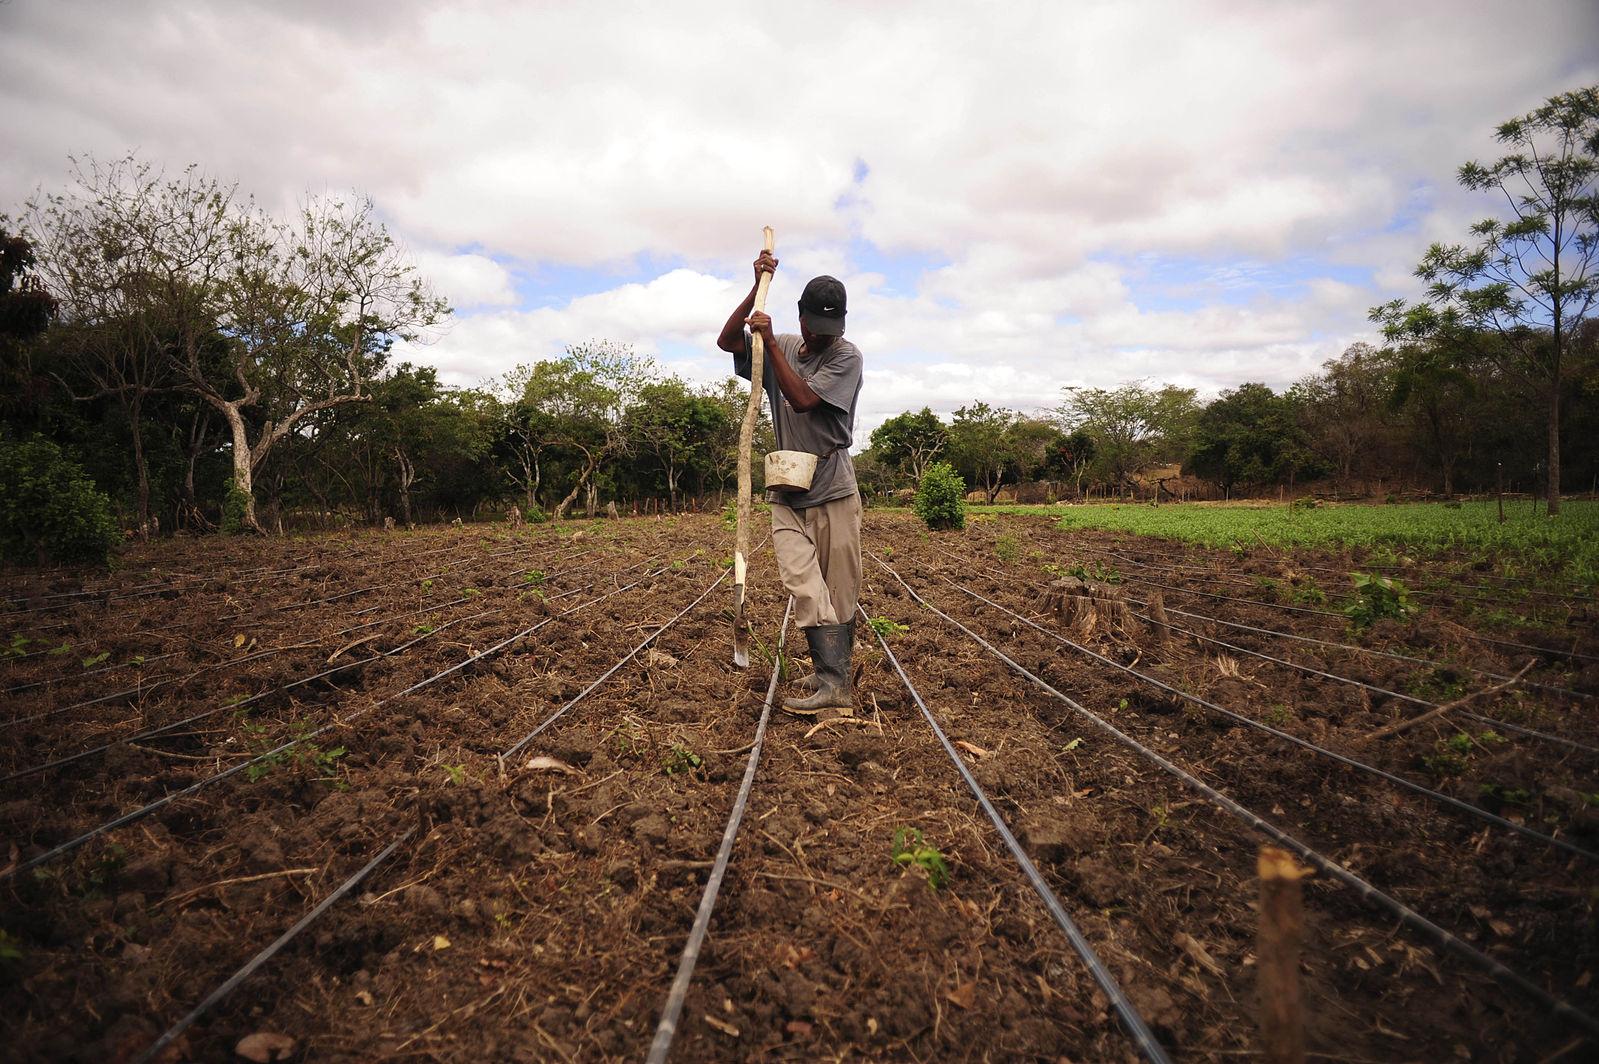 Farmer_works_a_field_of_beans,_Nicaragua.jpg